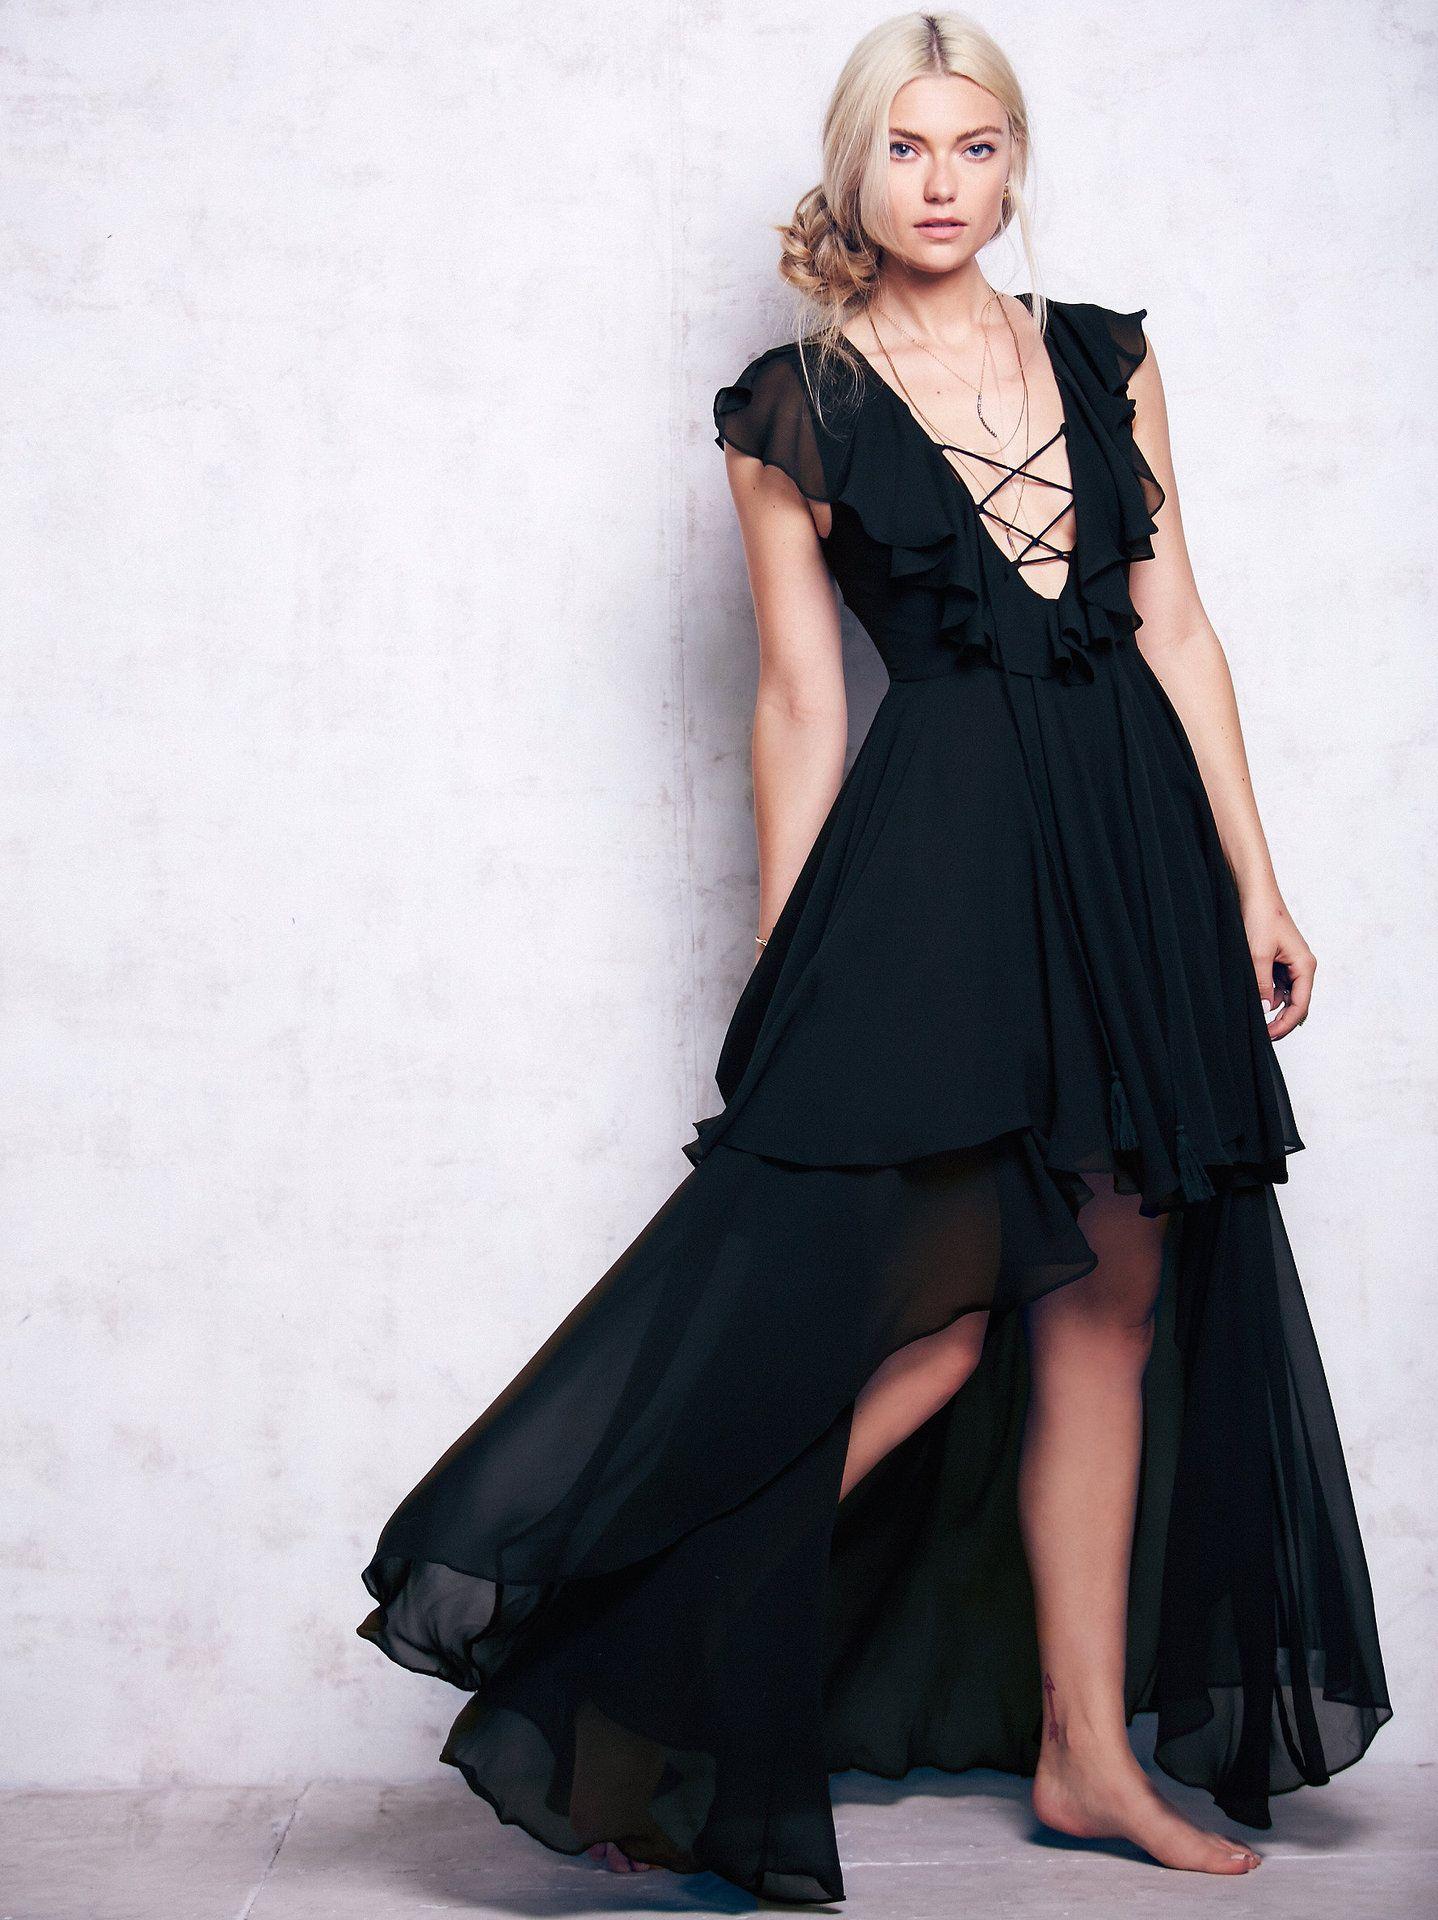 Cheap dress up girls for kids 477ce6e4ce2e